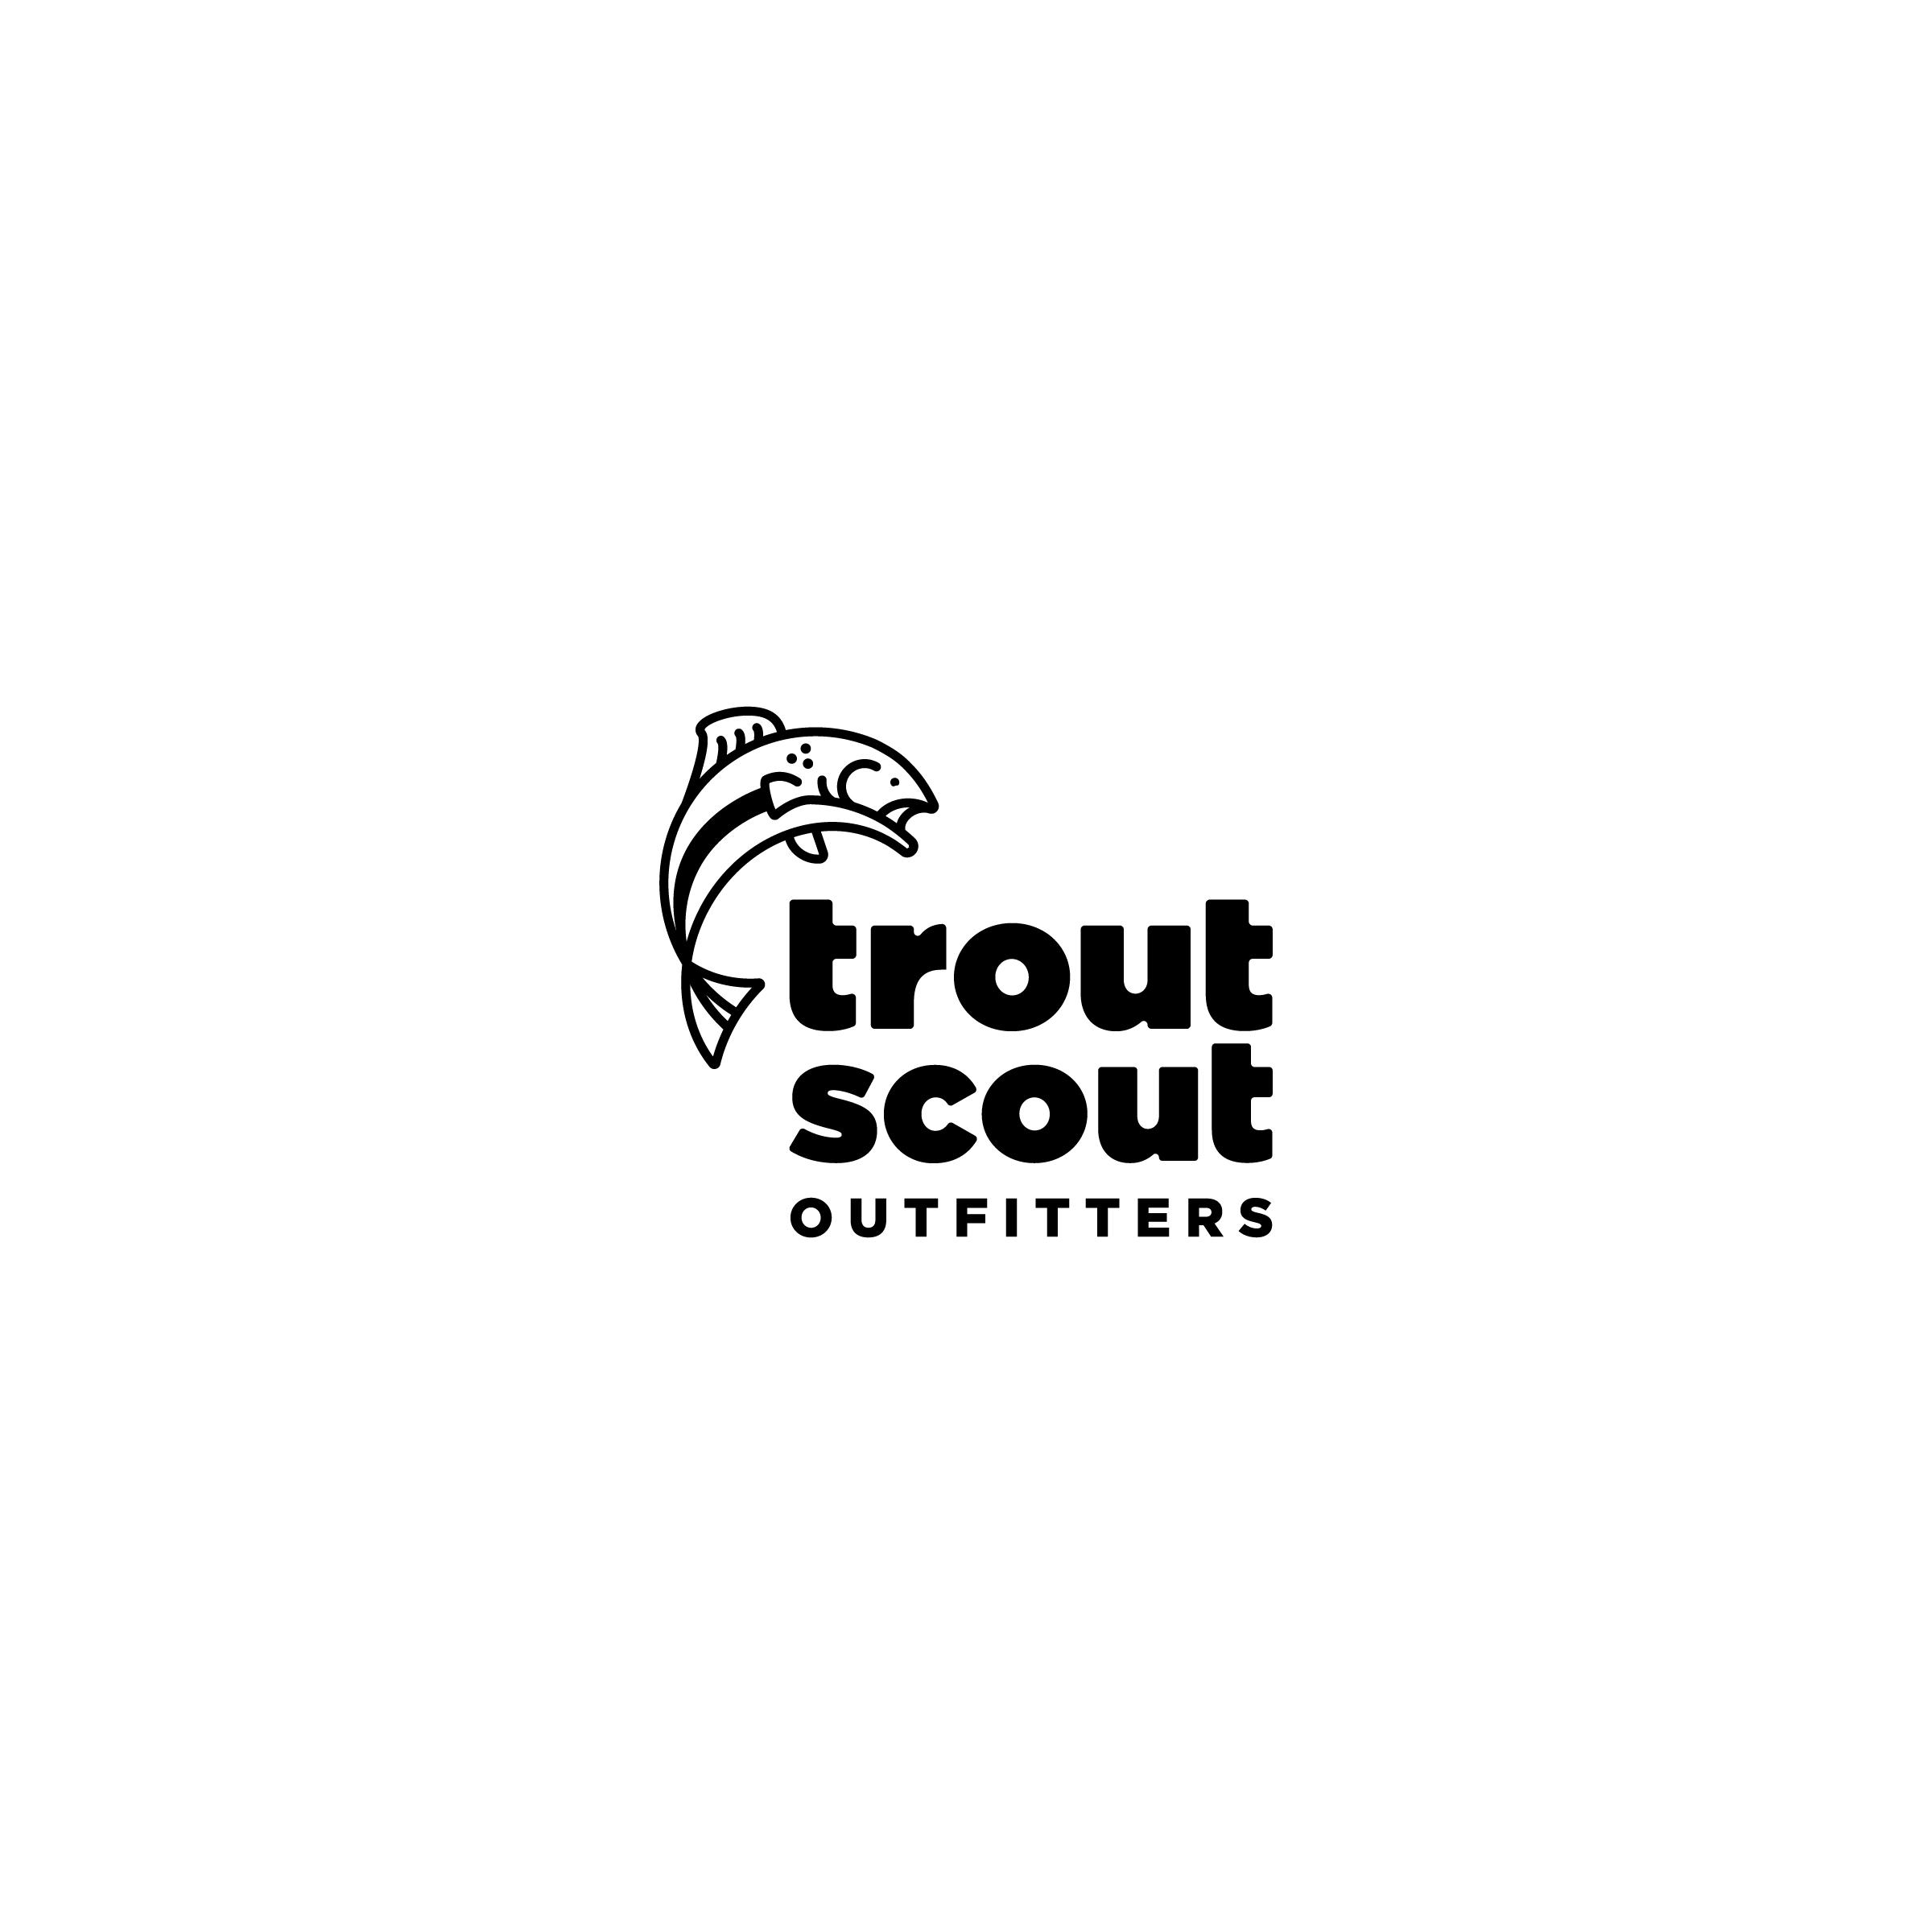 TroutScoutOutfitters_Black_Vert.jpg